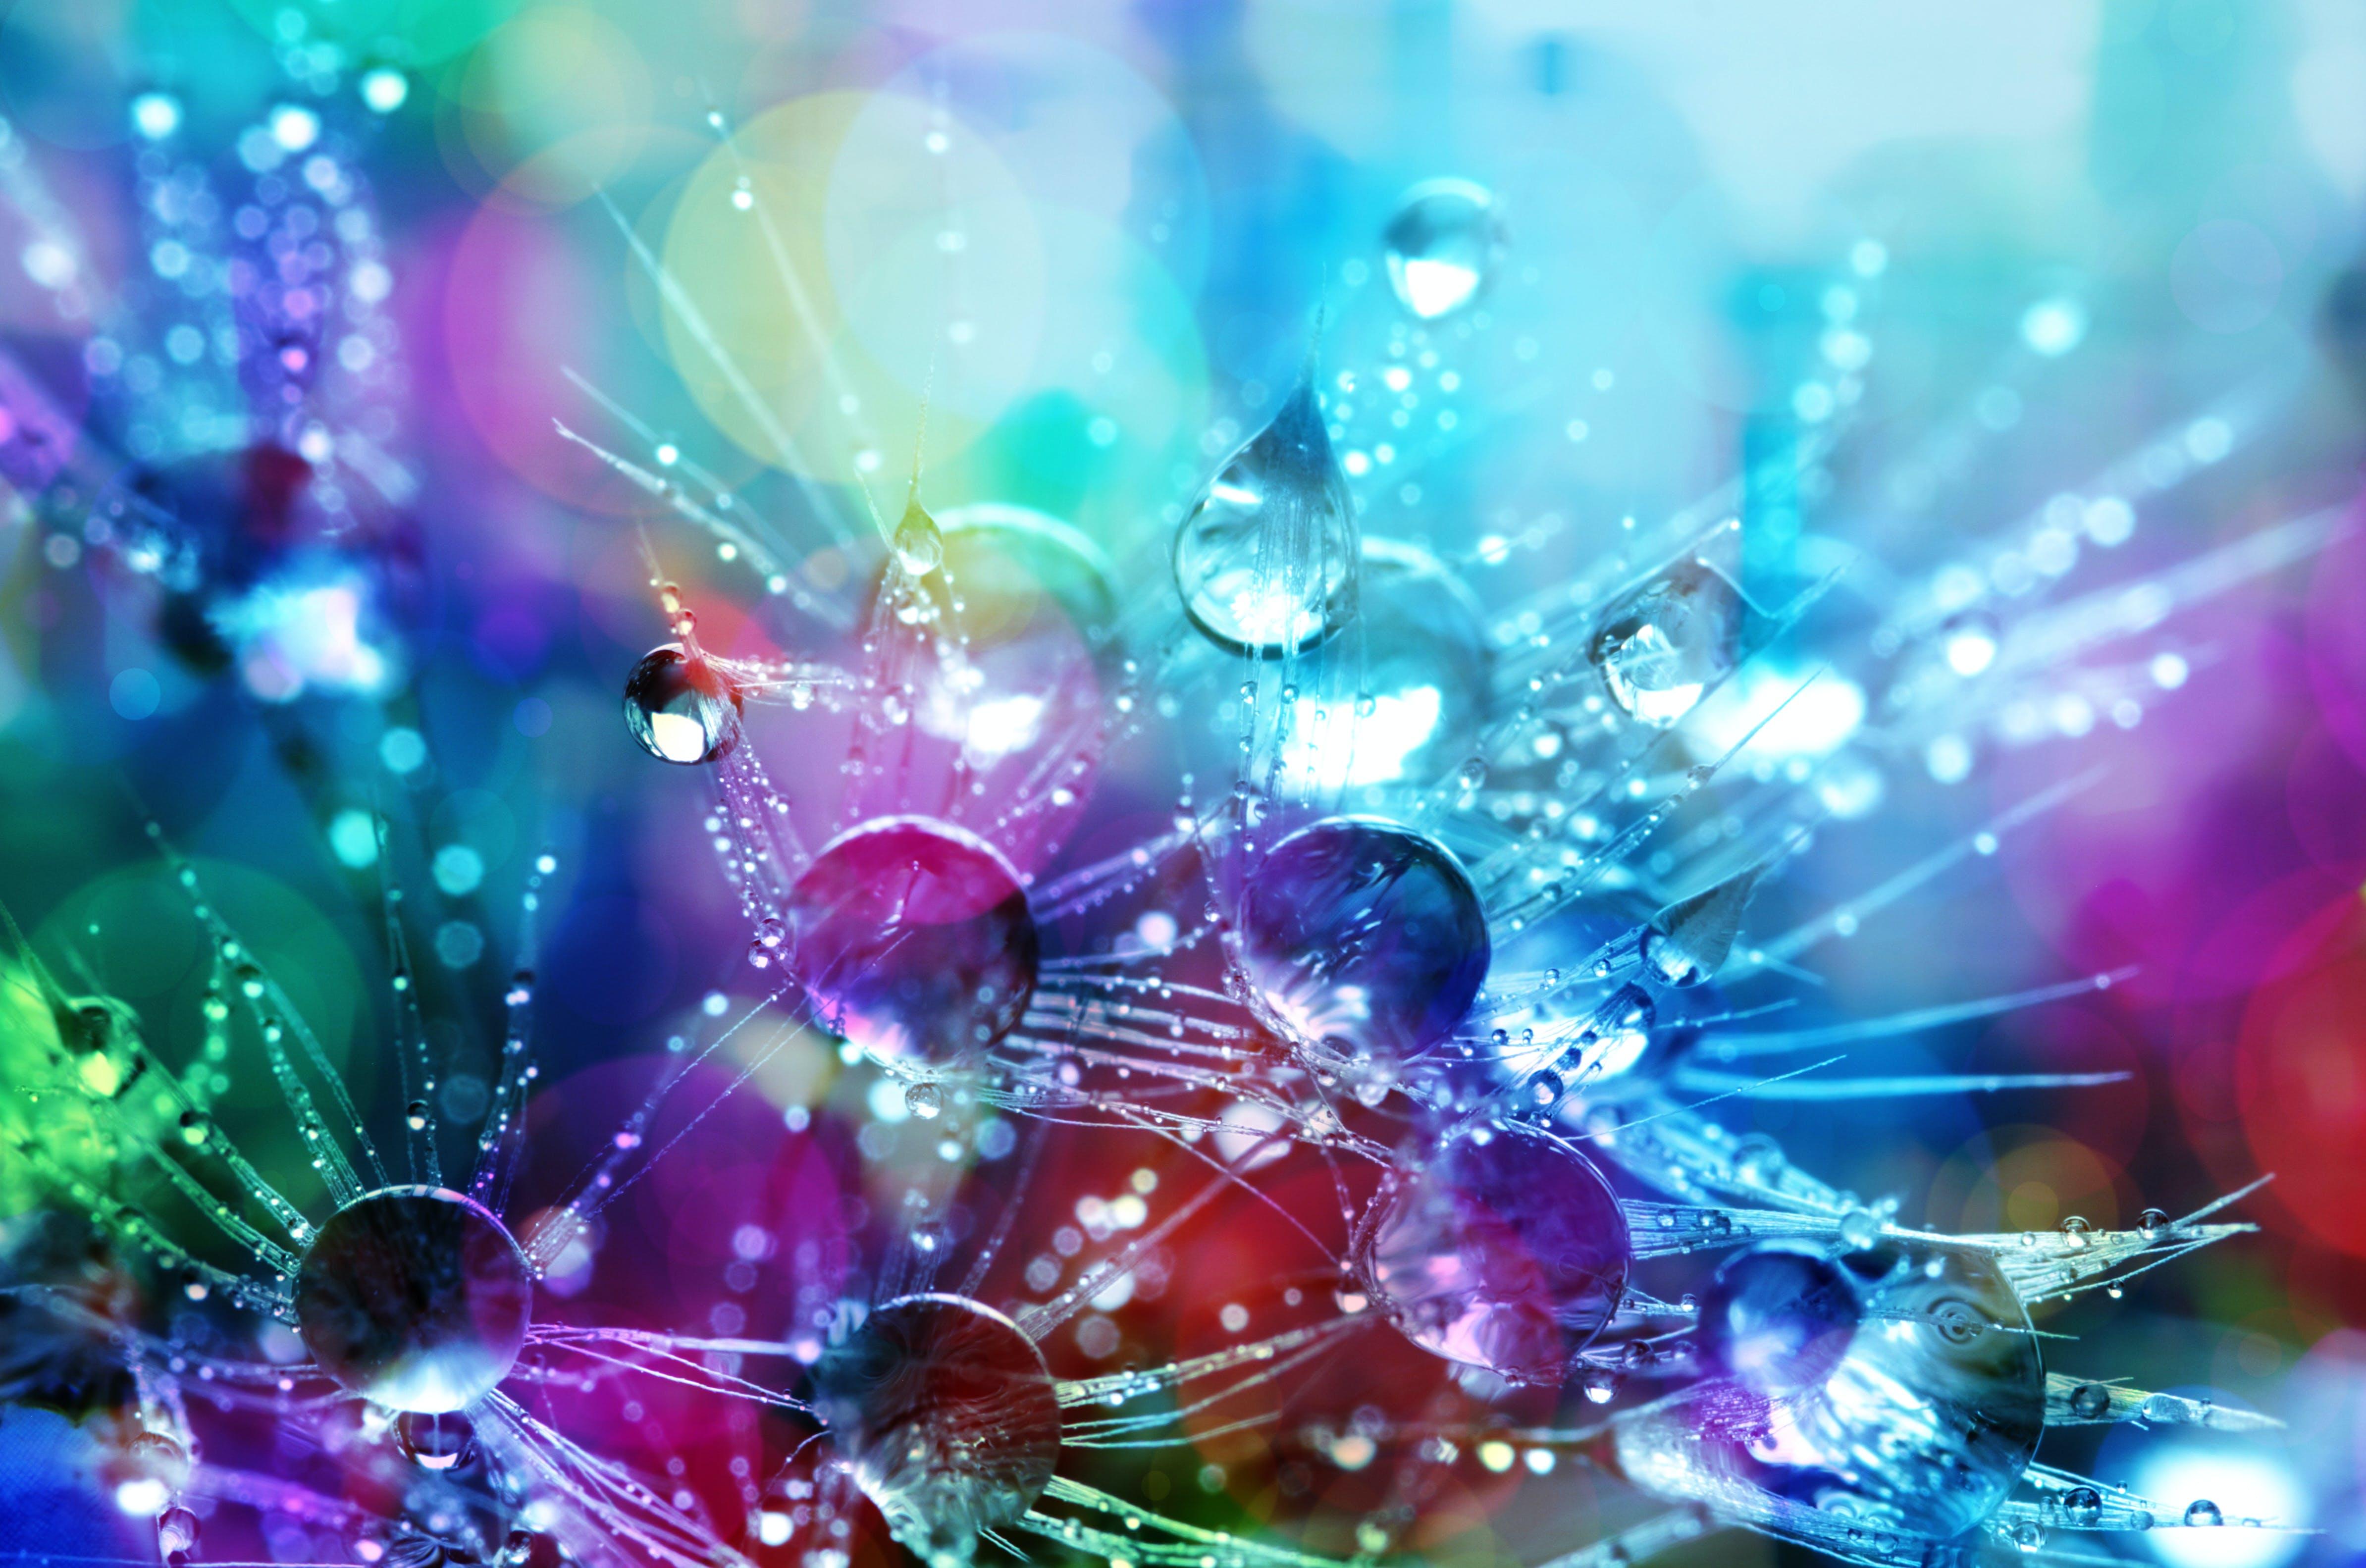 Bokeh Shot of Water Droplets